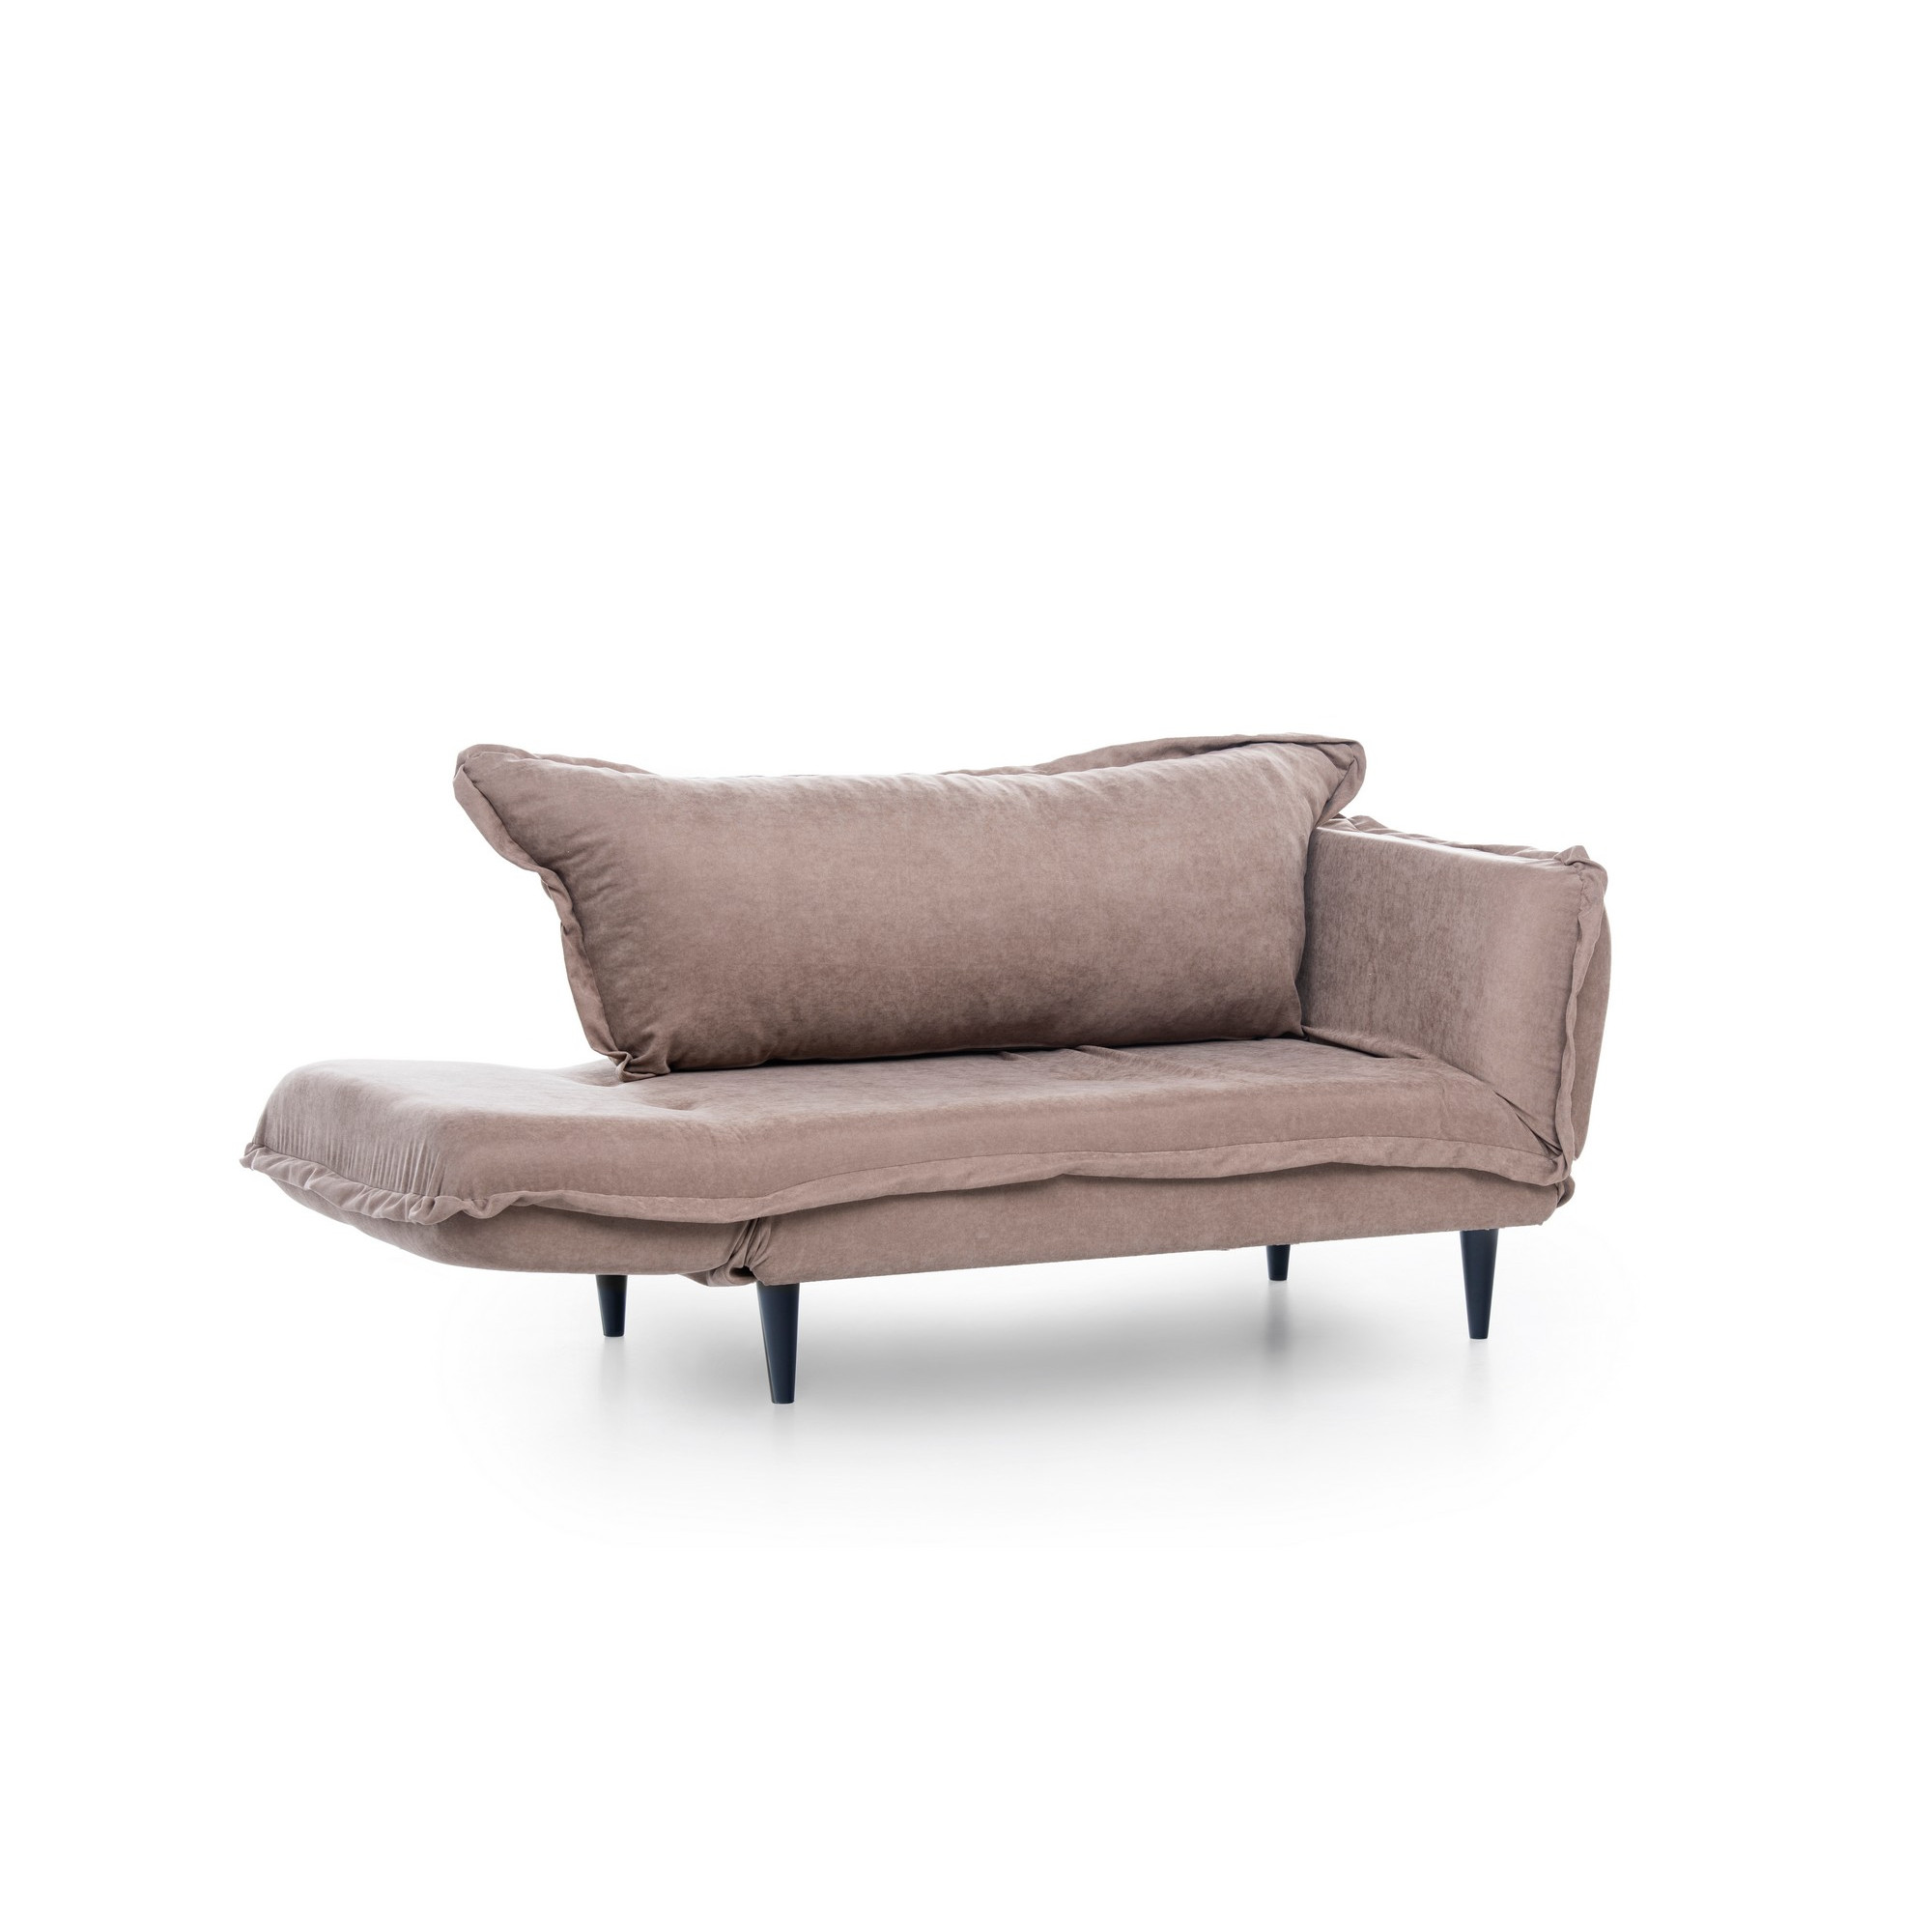 3-Sitz-Sofabett Vino   Beige